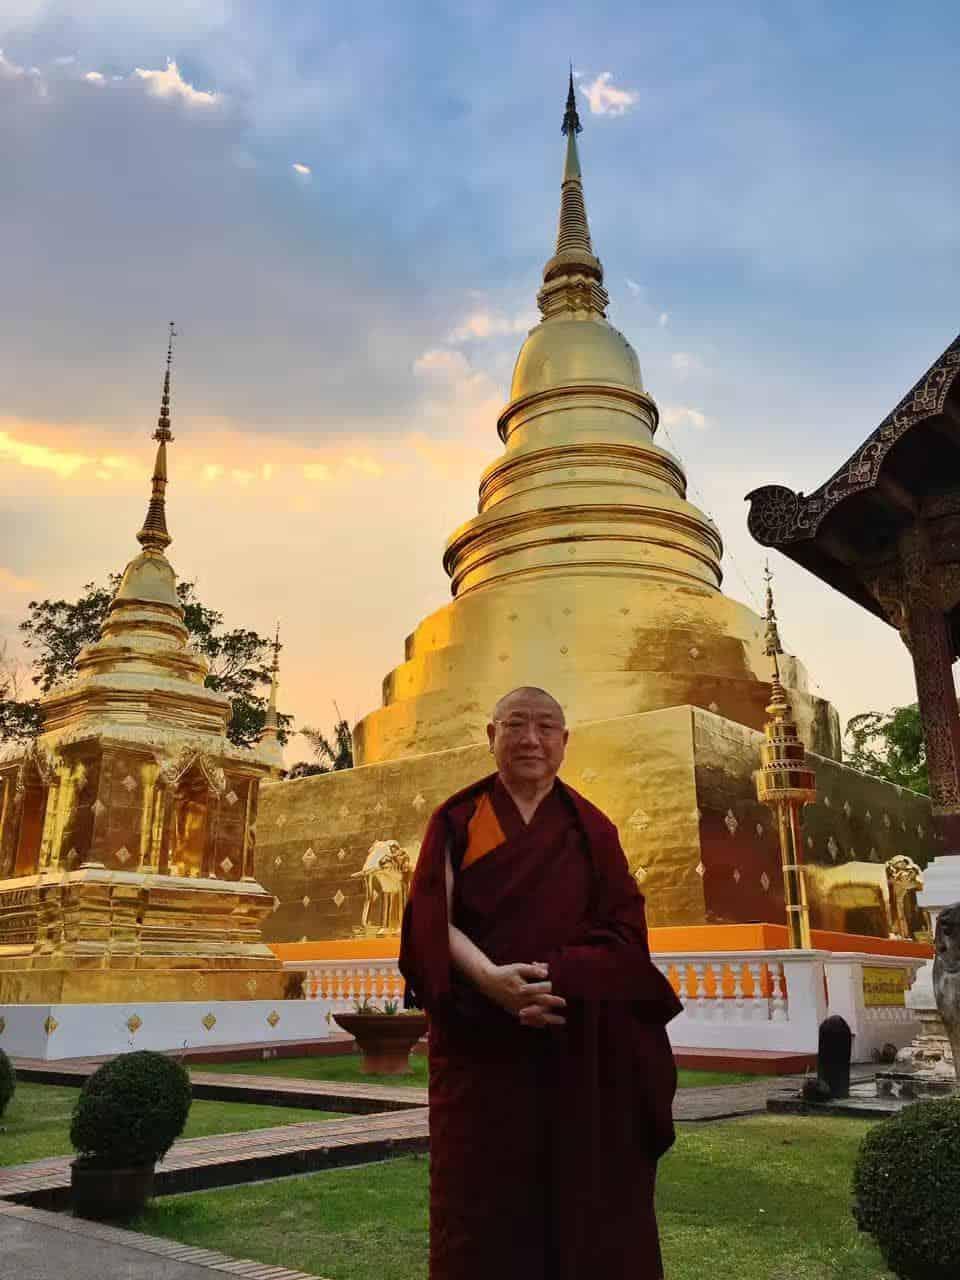 Gosok Rinpoche Thailand 2017 T008 03dd2d908e22bc92e7534f0989e2ccc